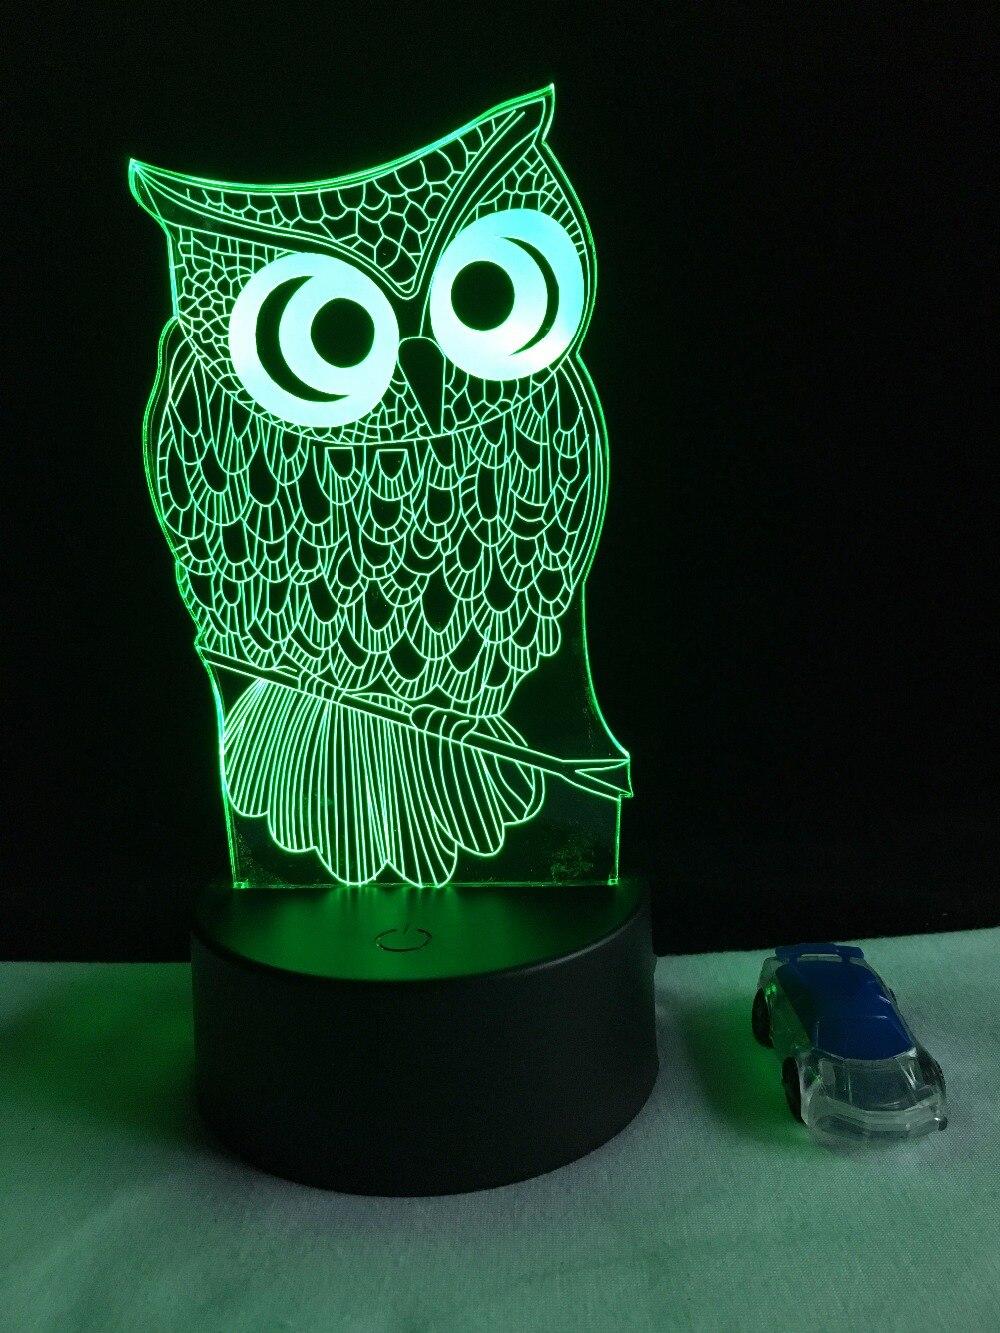 Luzes da Noite noite coruja rc toque remoto Function 1 : Led Bed Lamp/table Desk Lighting/bar Light